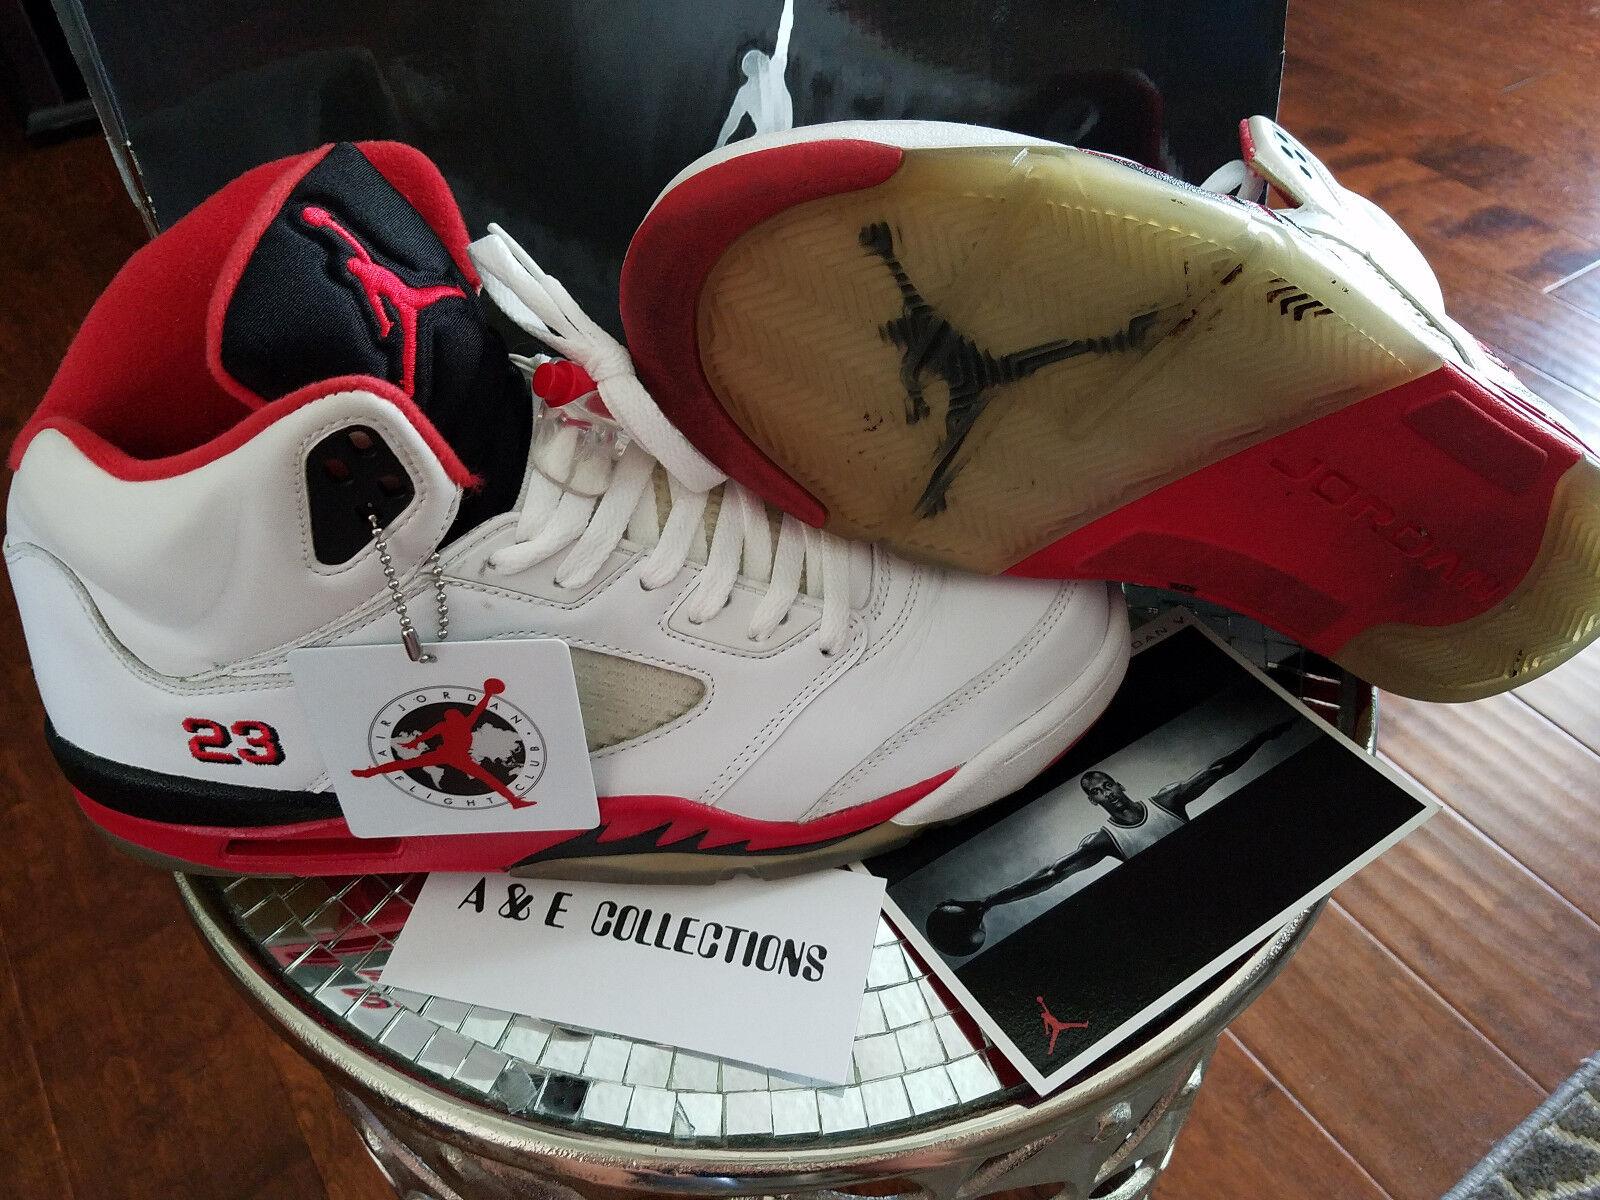 Nike Air Jordan 5 V Retro Fire Red 2018 Size 11.5 136027-162 bred concord